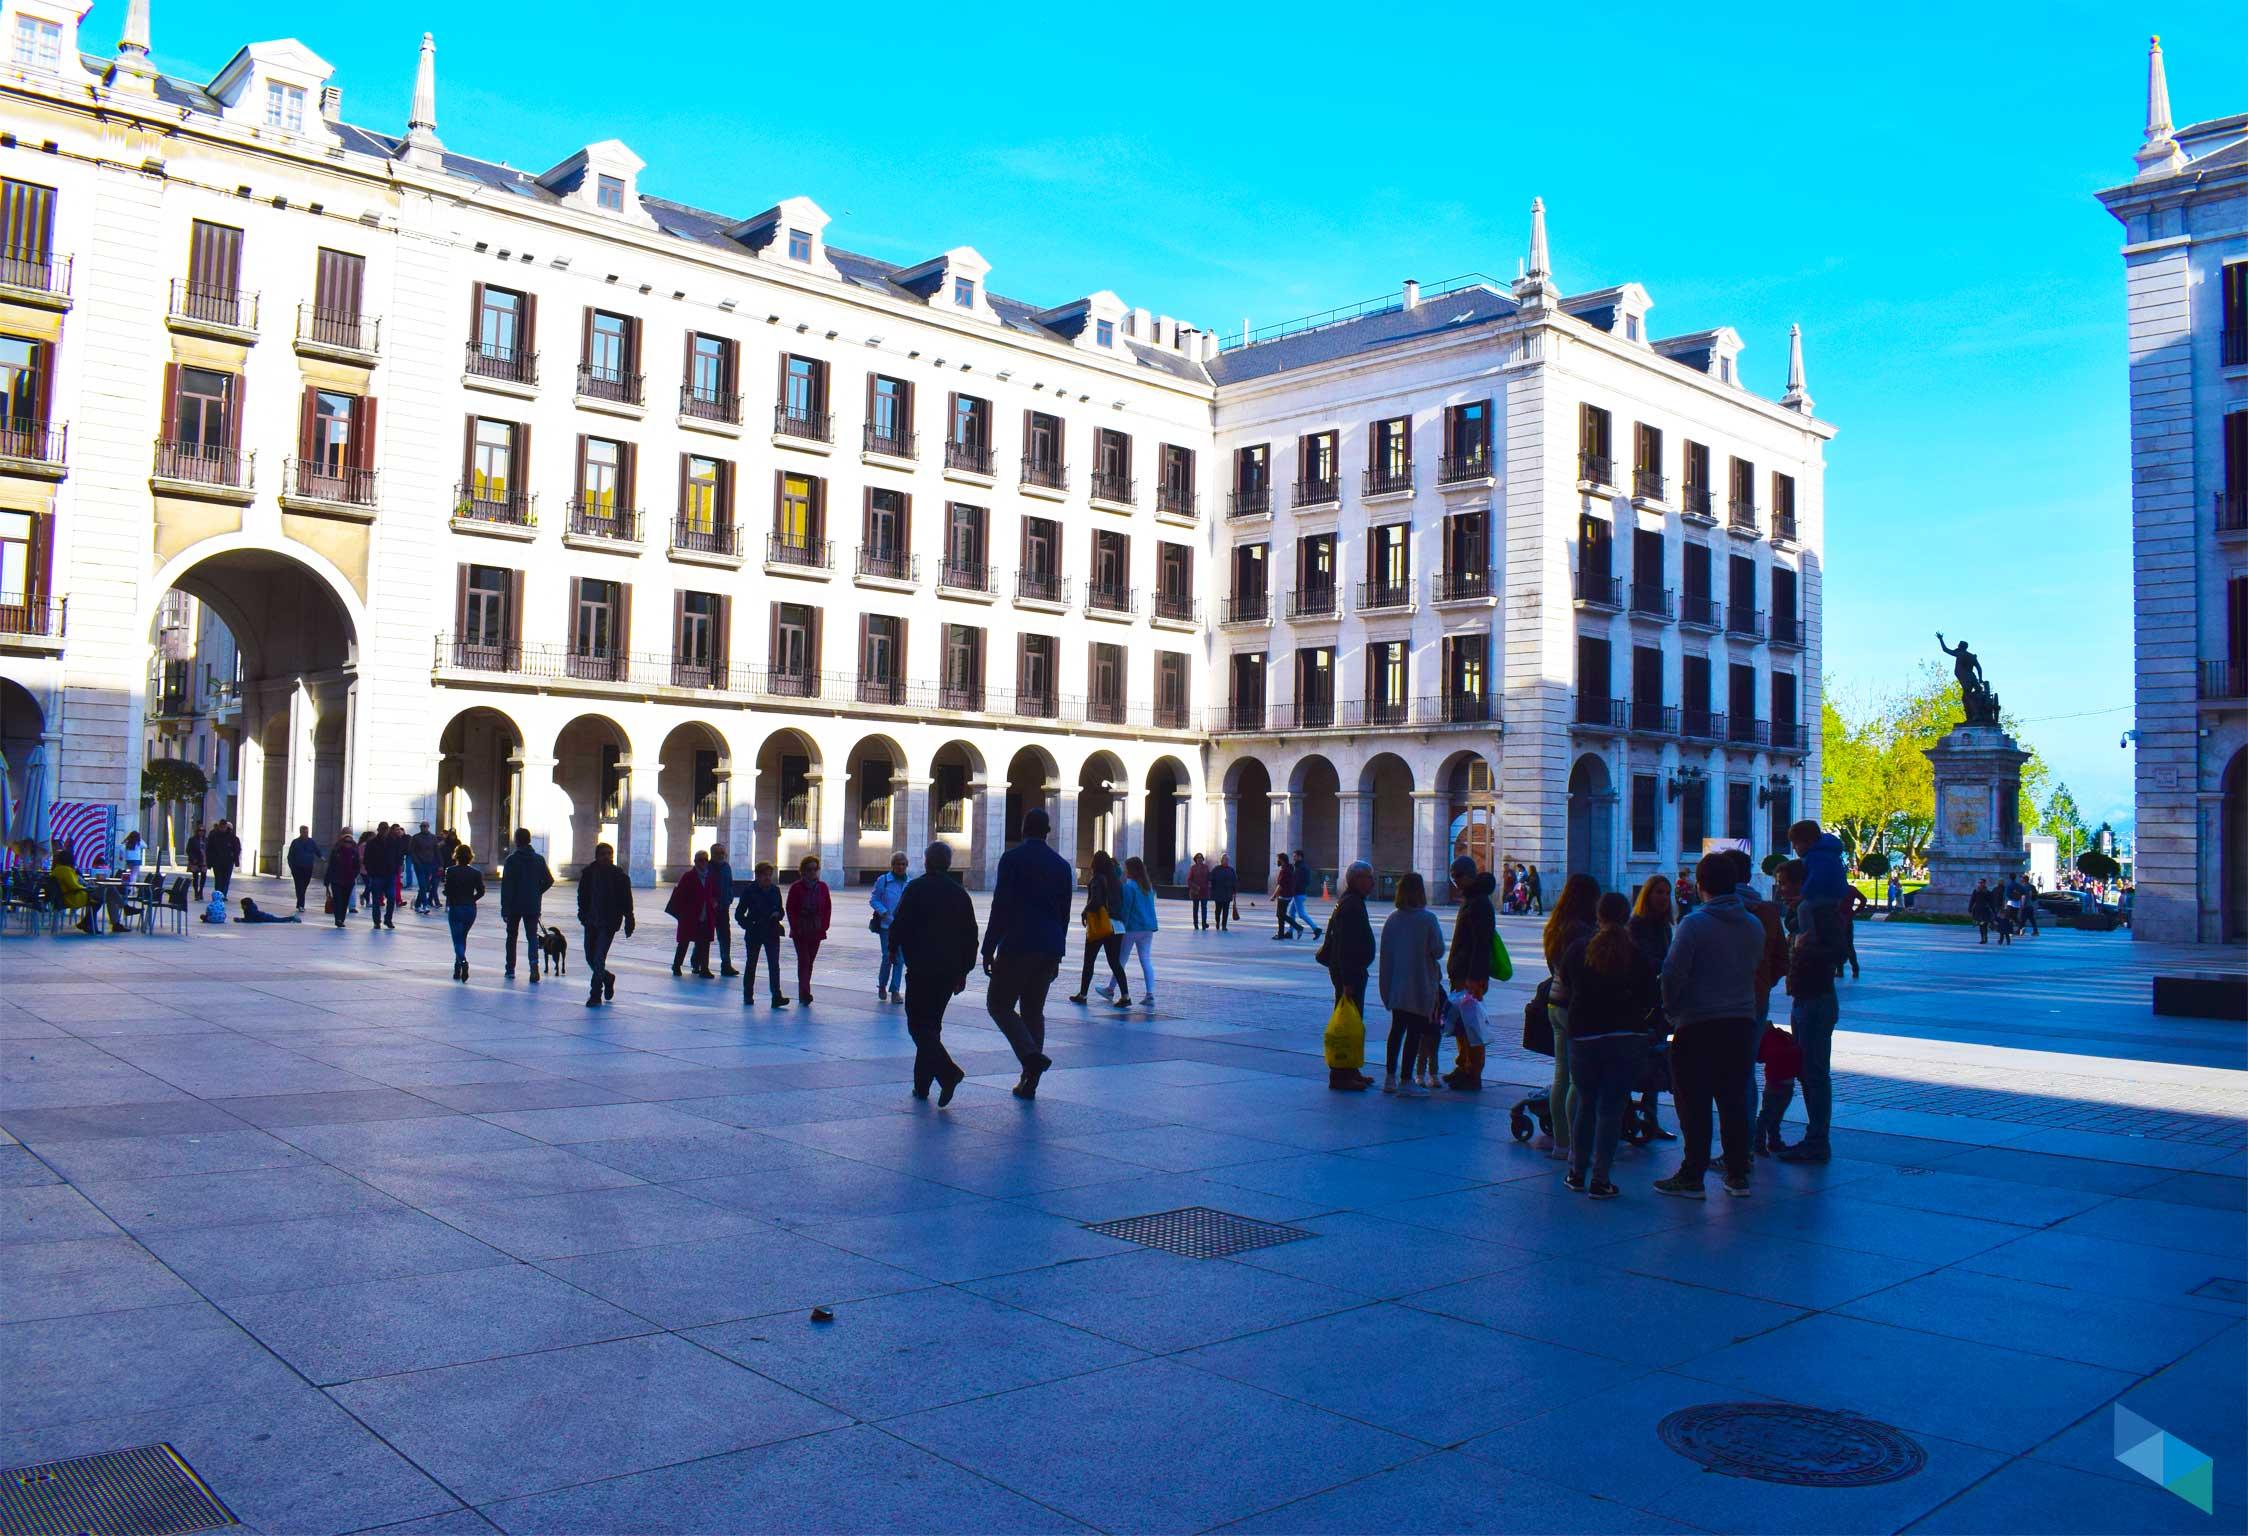 Plaza de Porticada